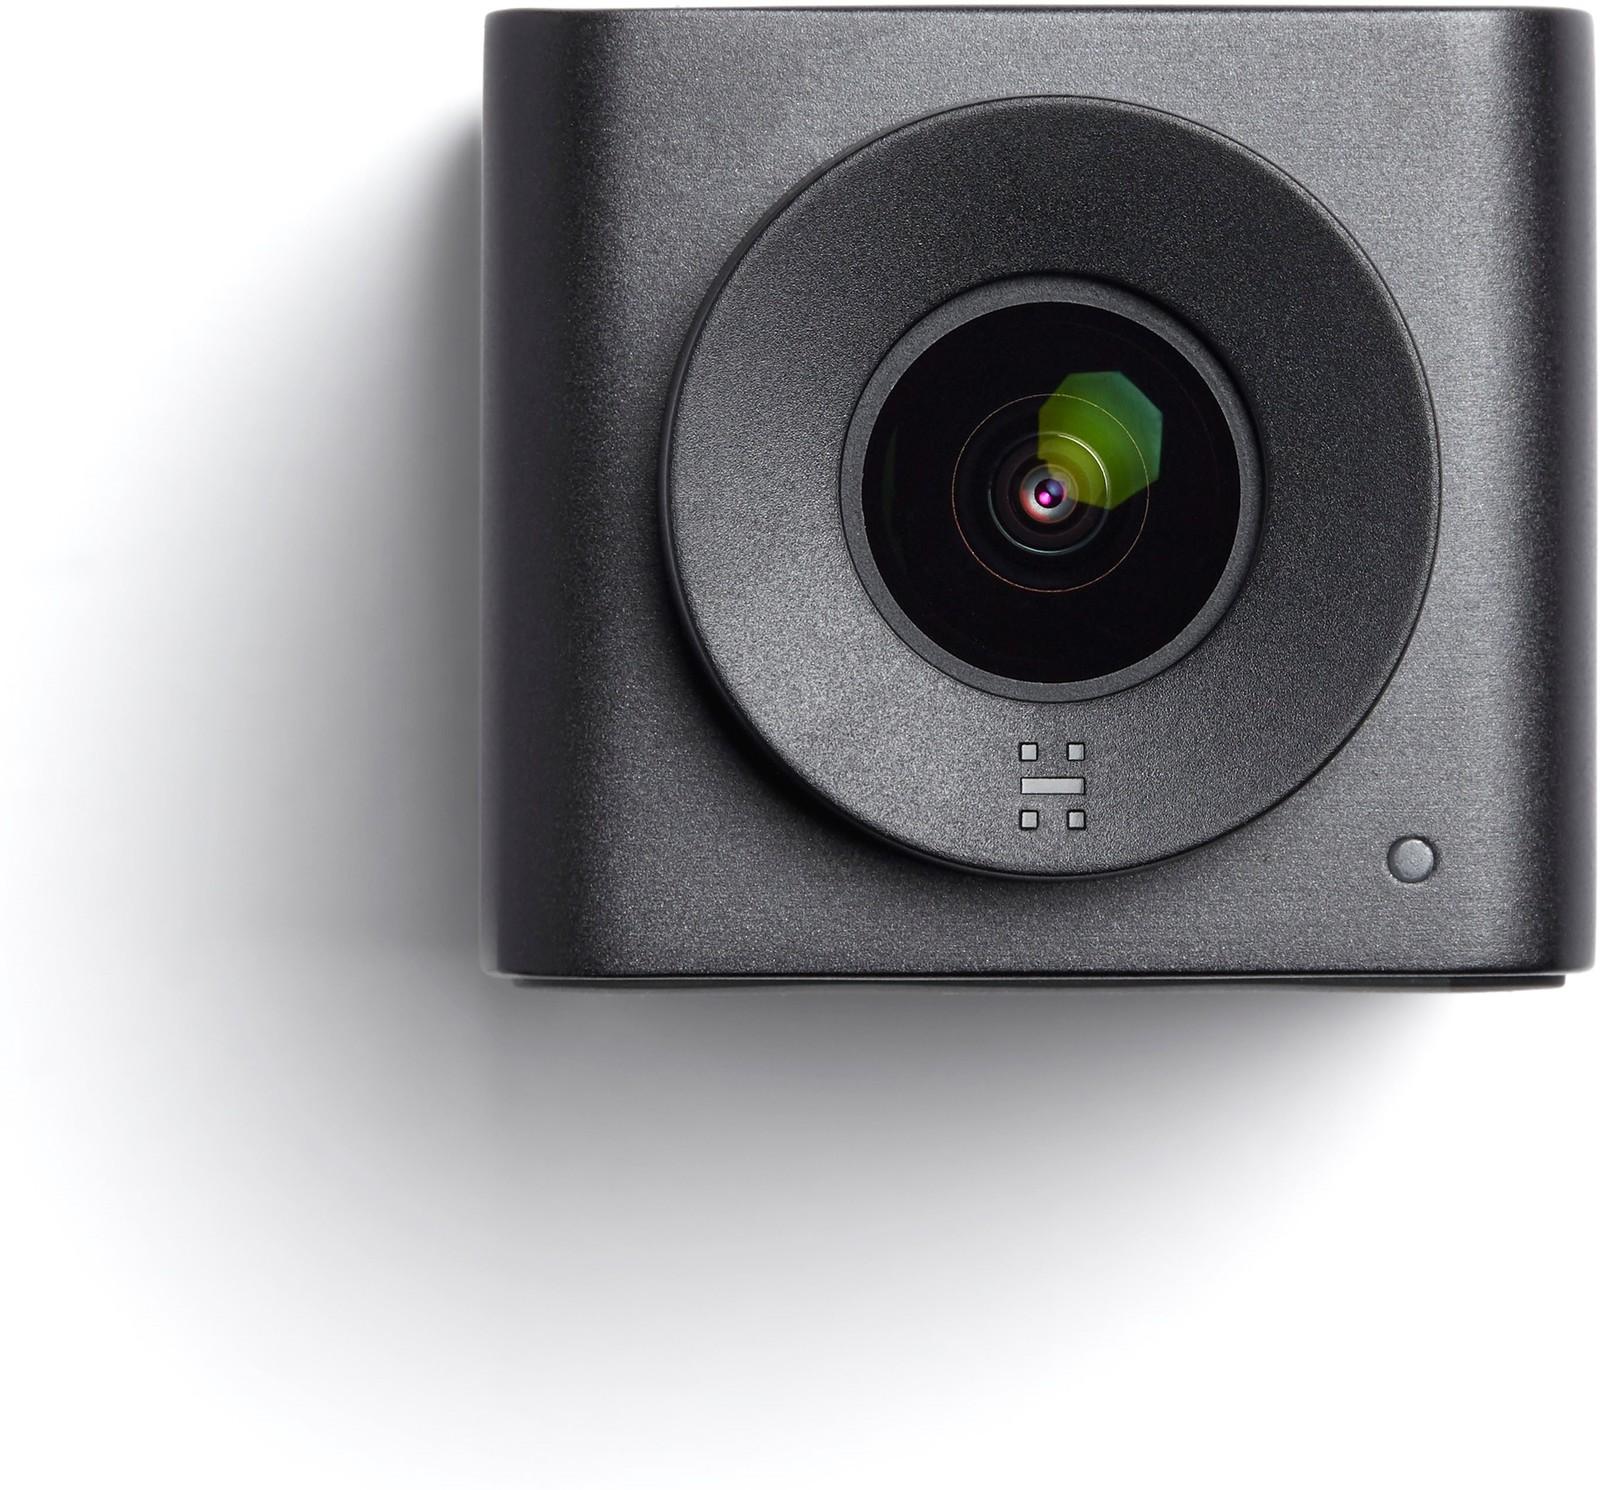 Huddly IQ Camera 0,6 Cable